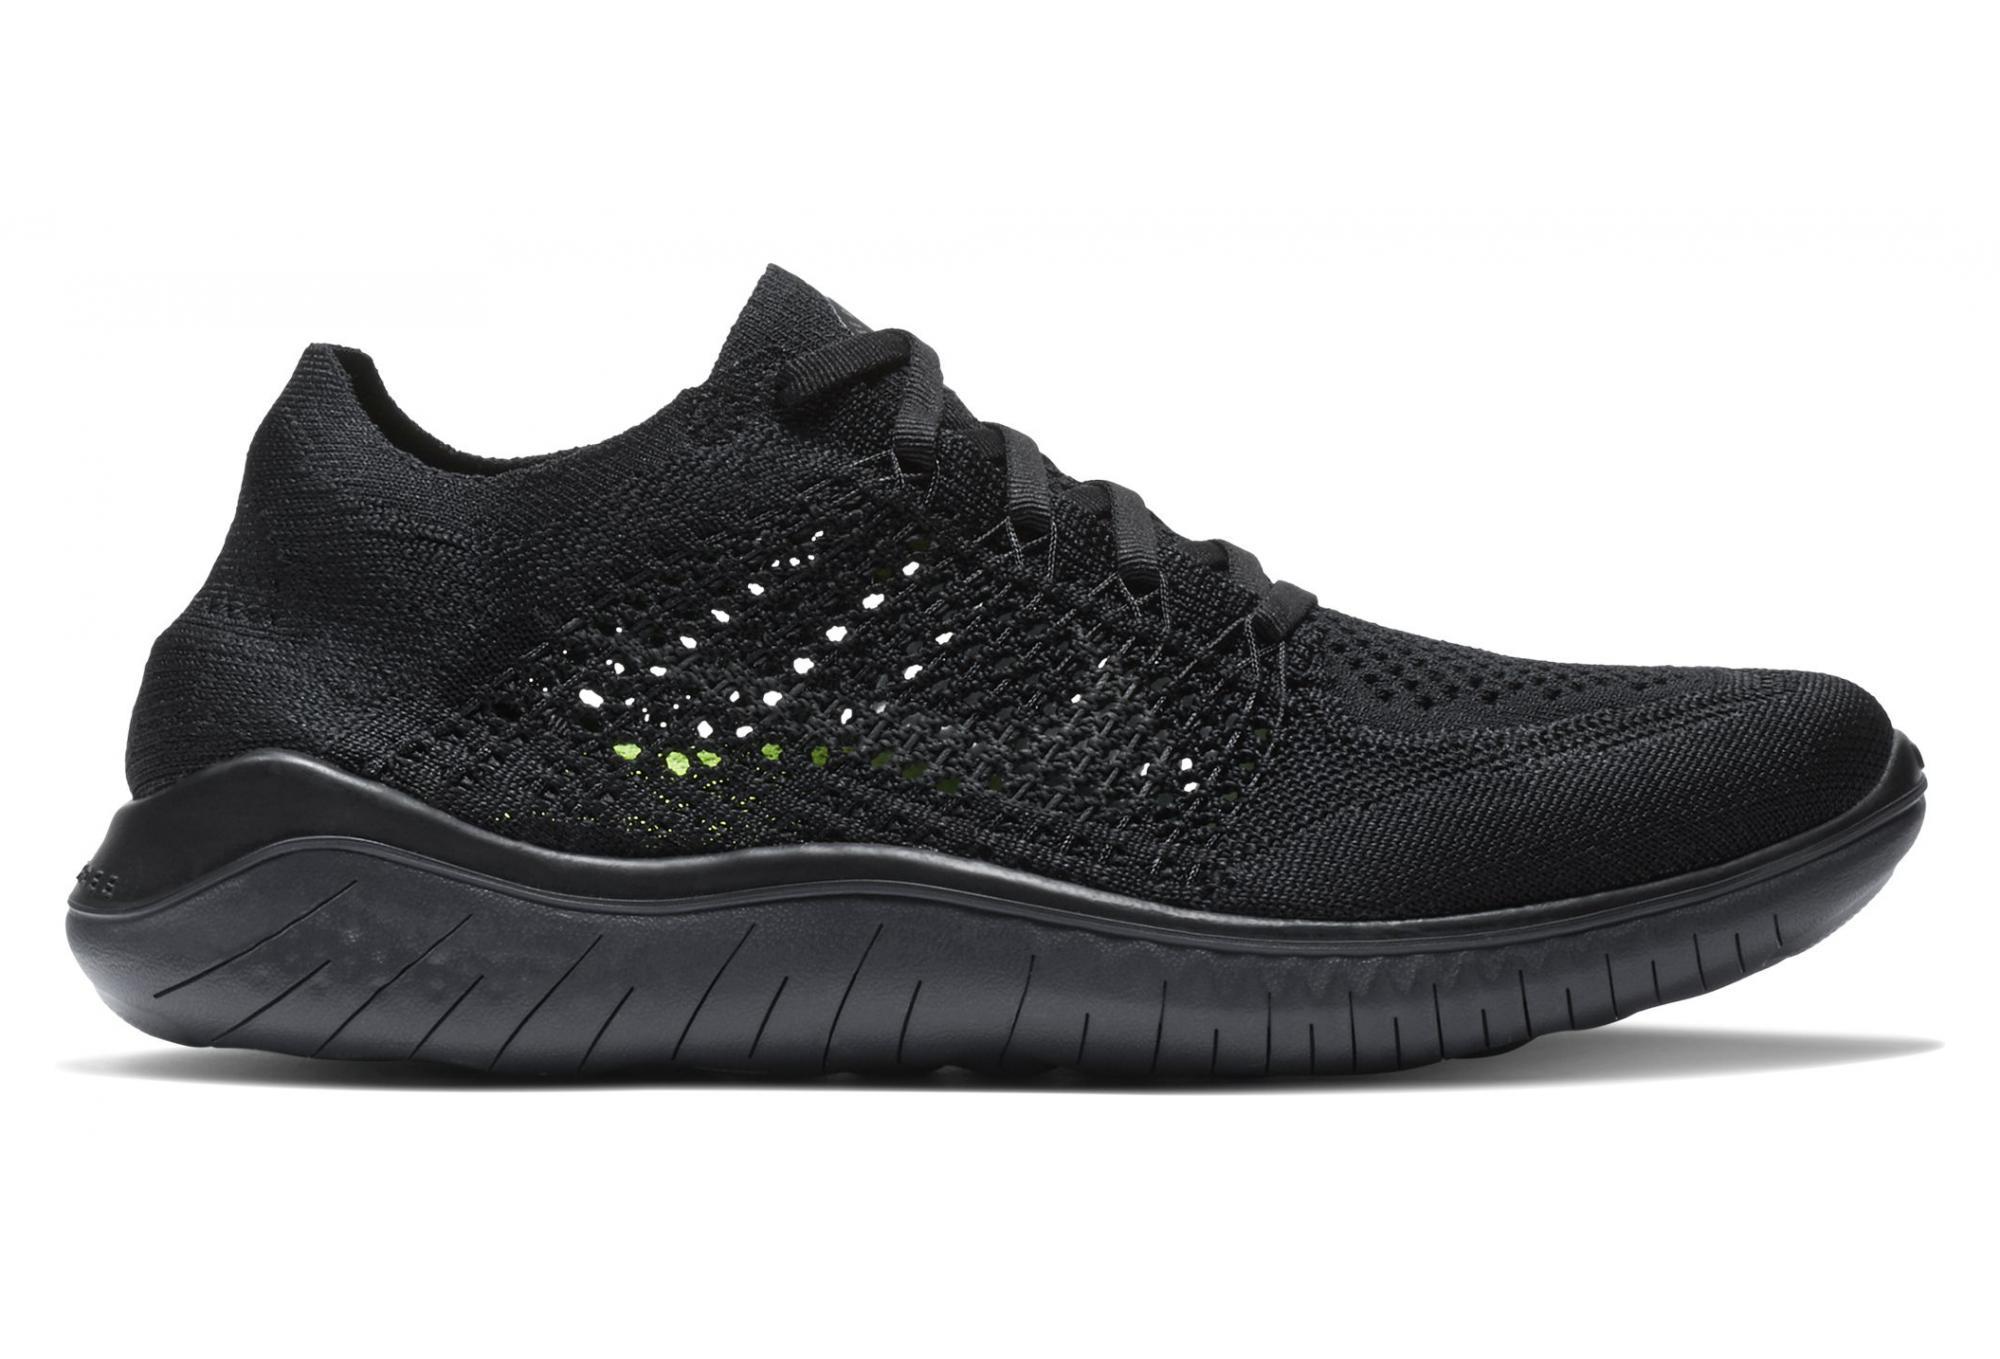 newest 42b41 9bc41 Nike Shoes Free RN Flyknit 2018 Black Women